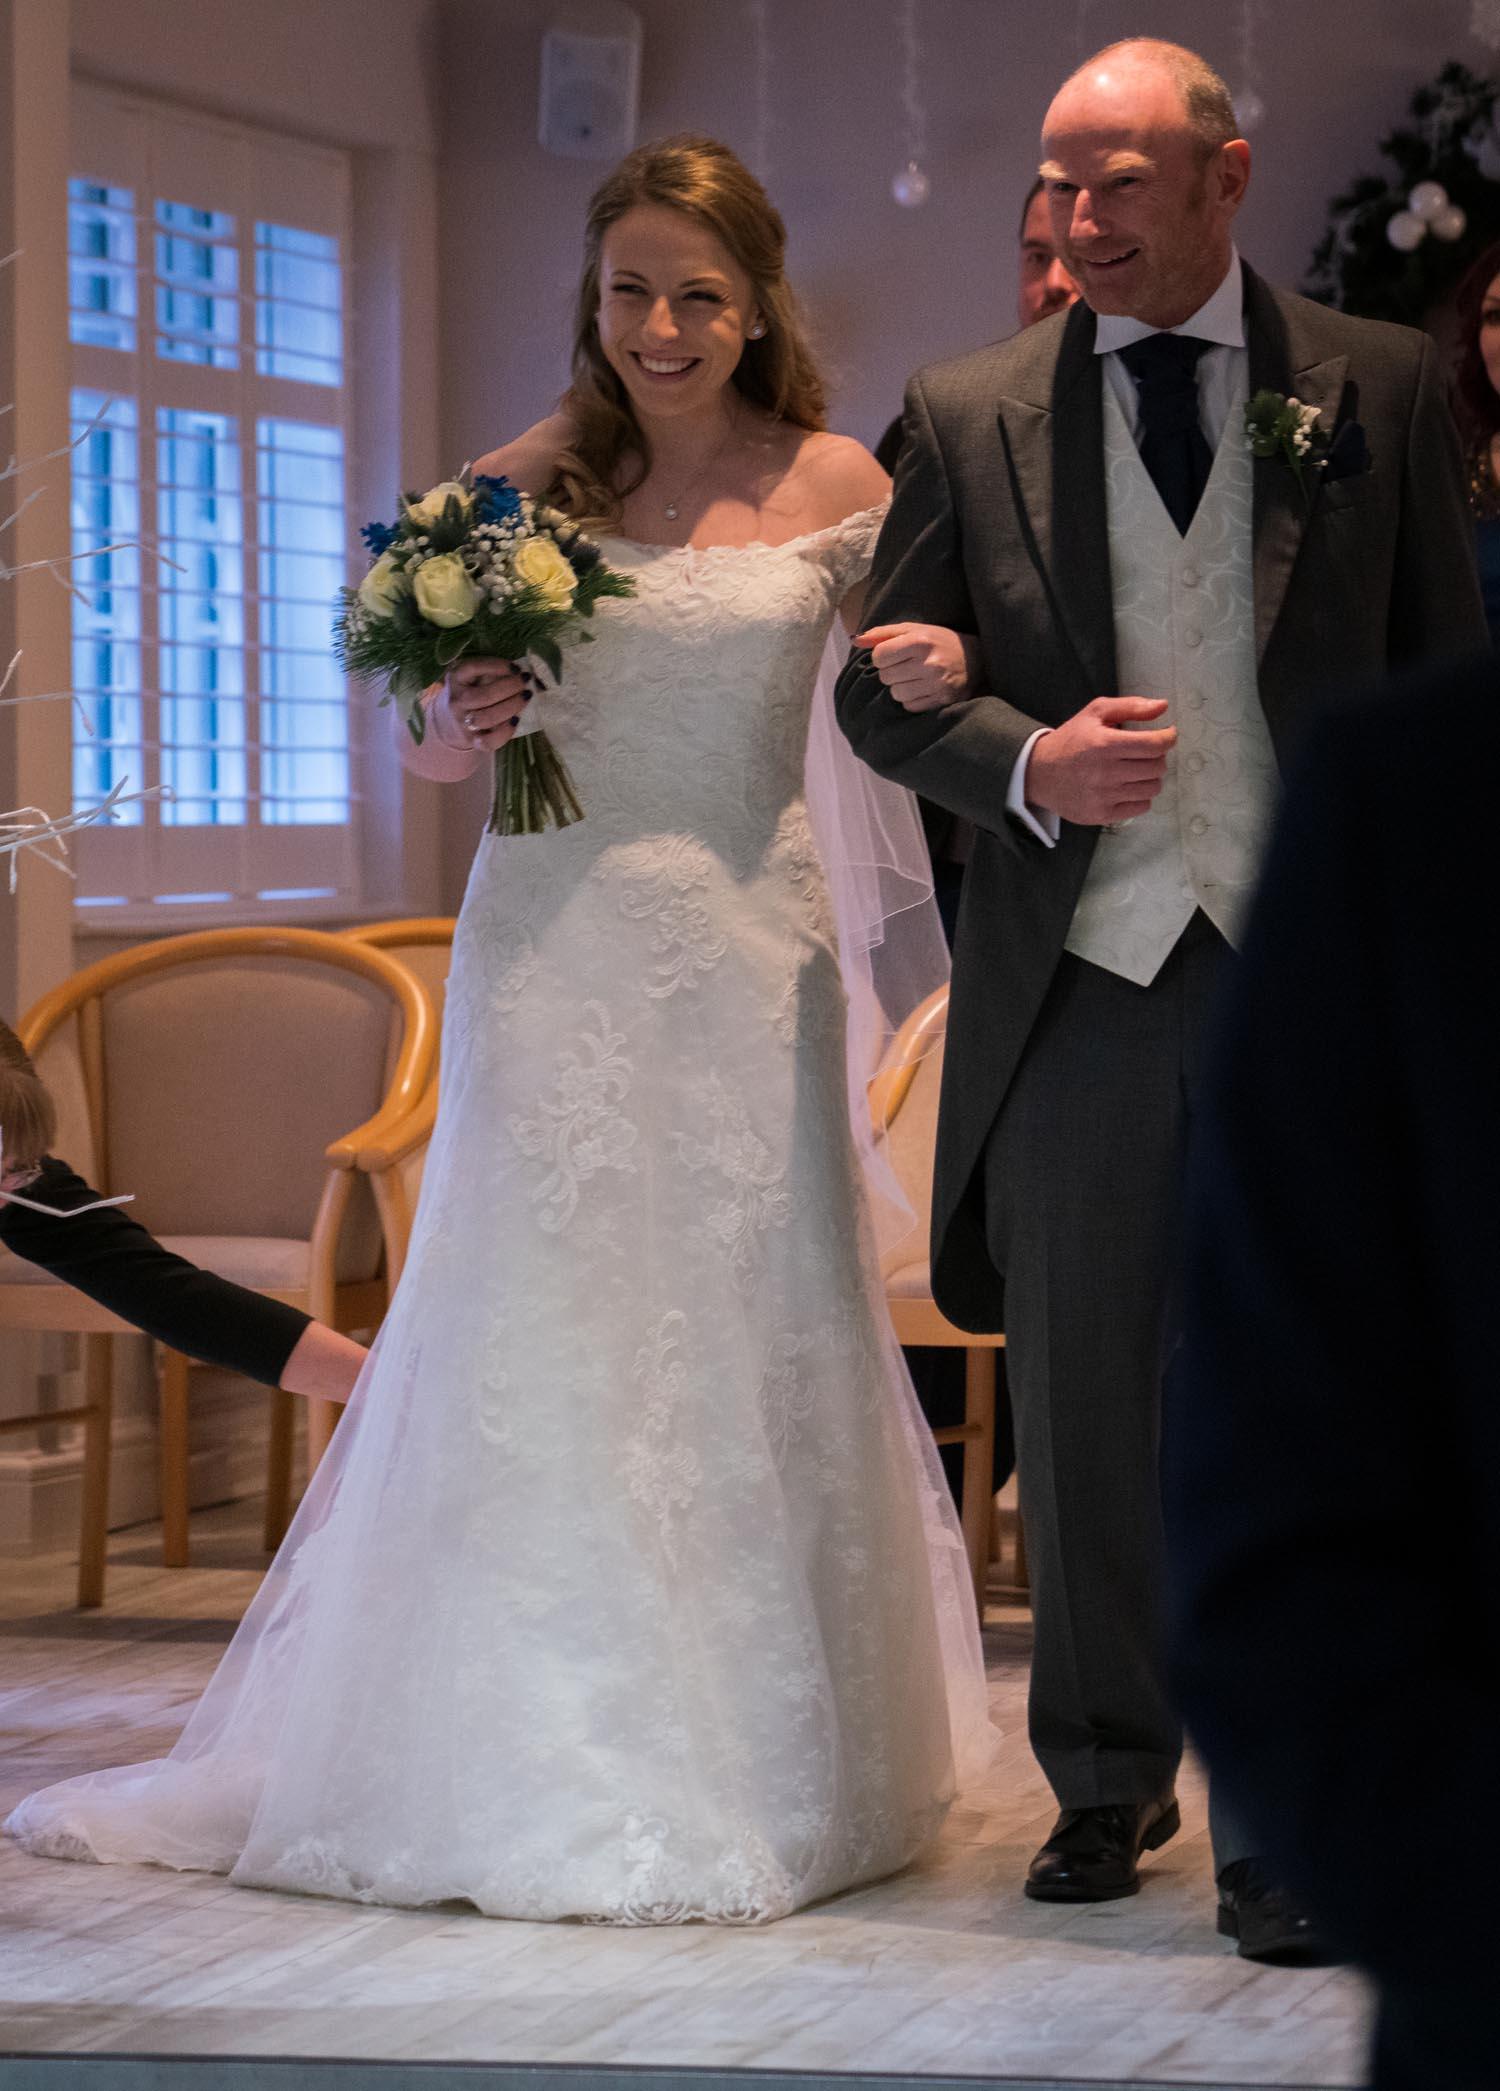 wedding-photos-ceremony-ye-olde-plough-house-essex-350.jpg